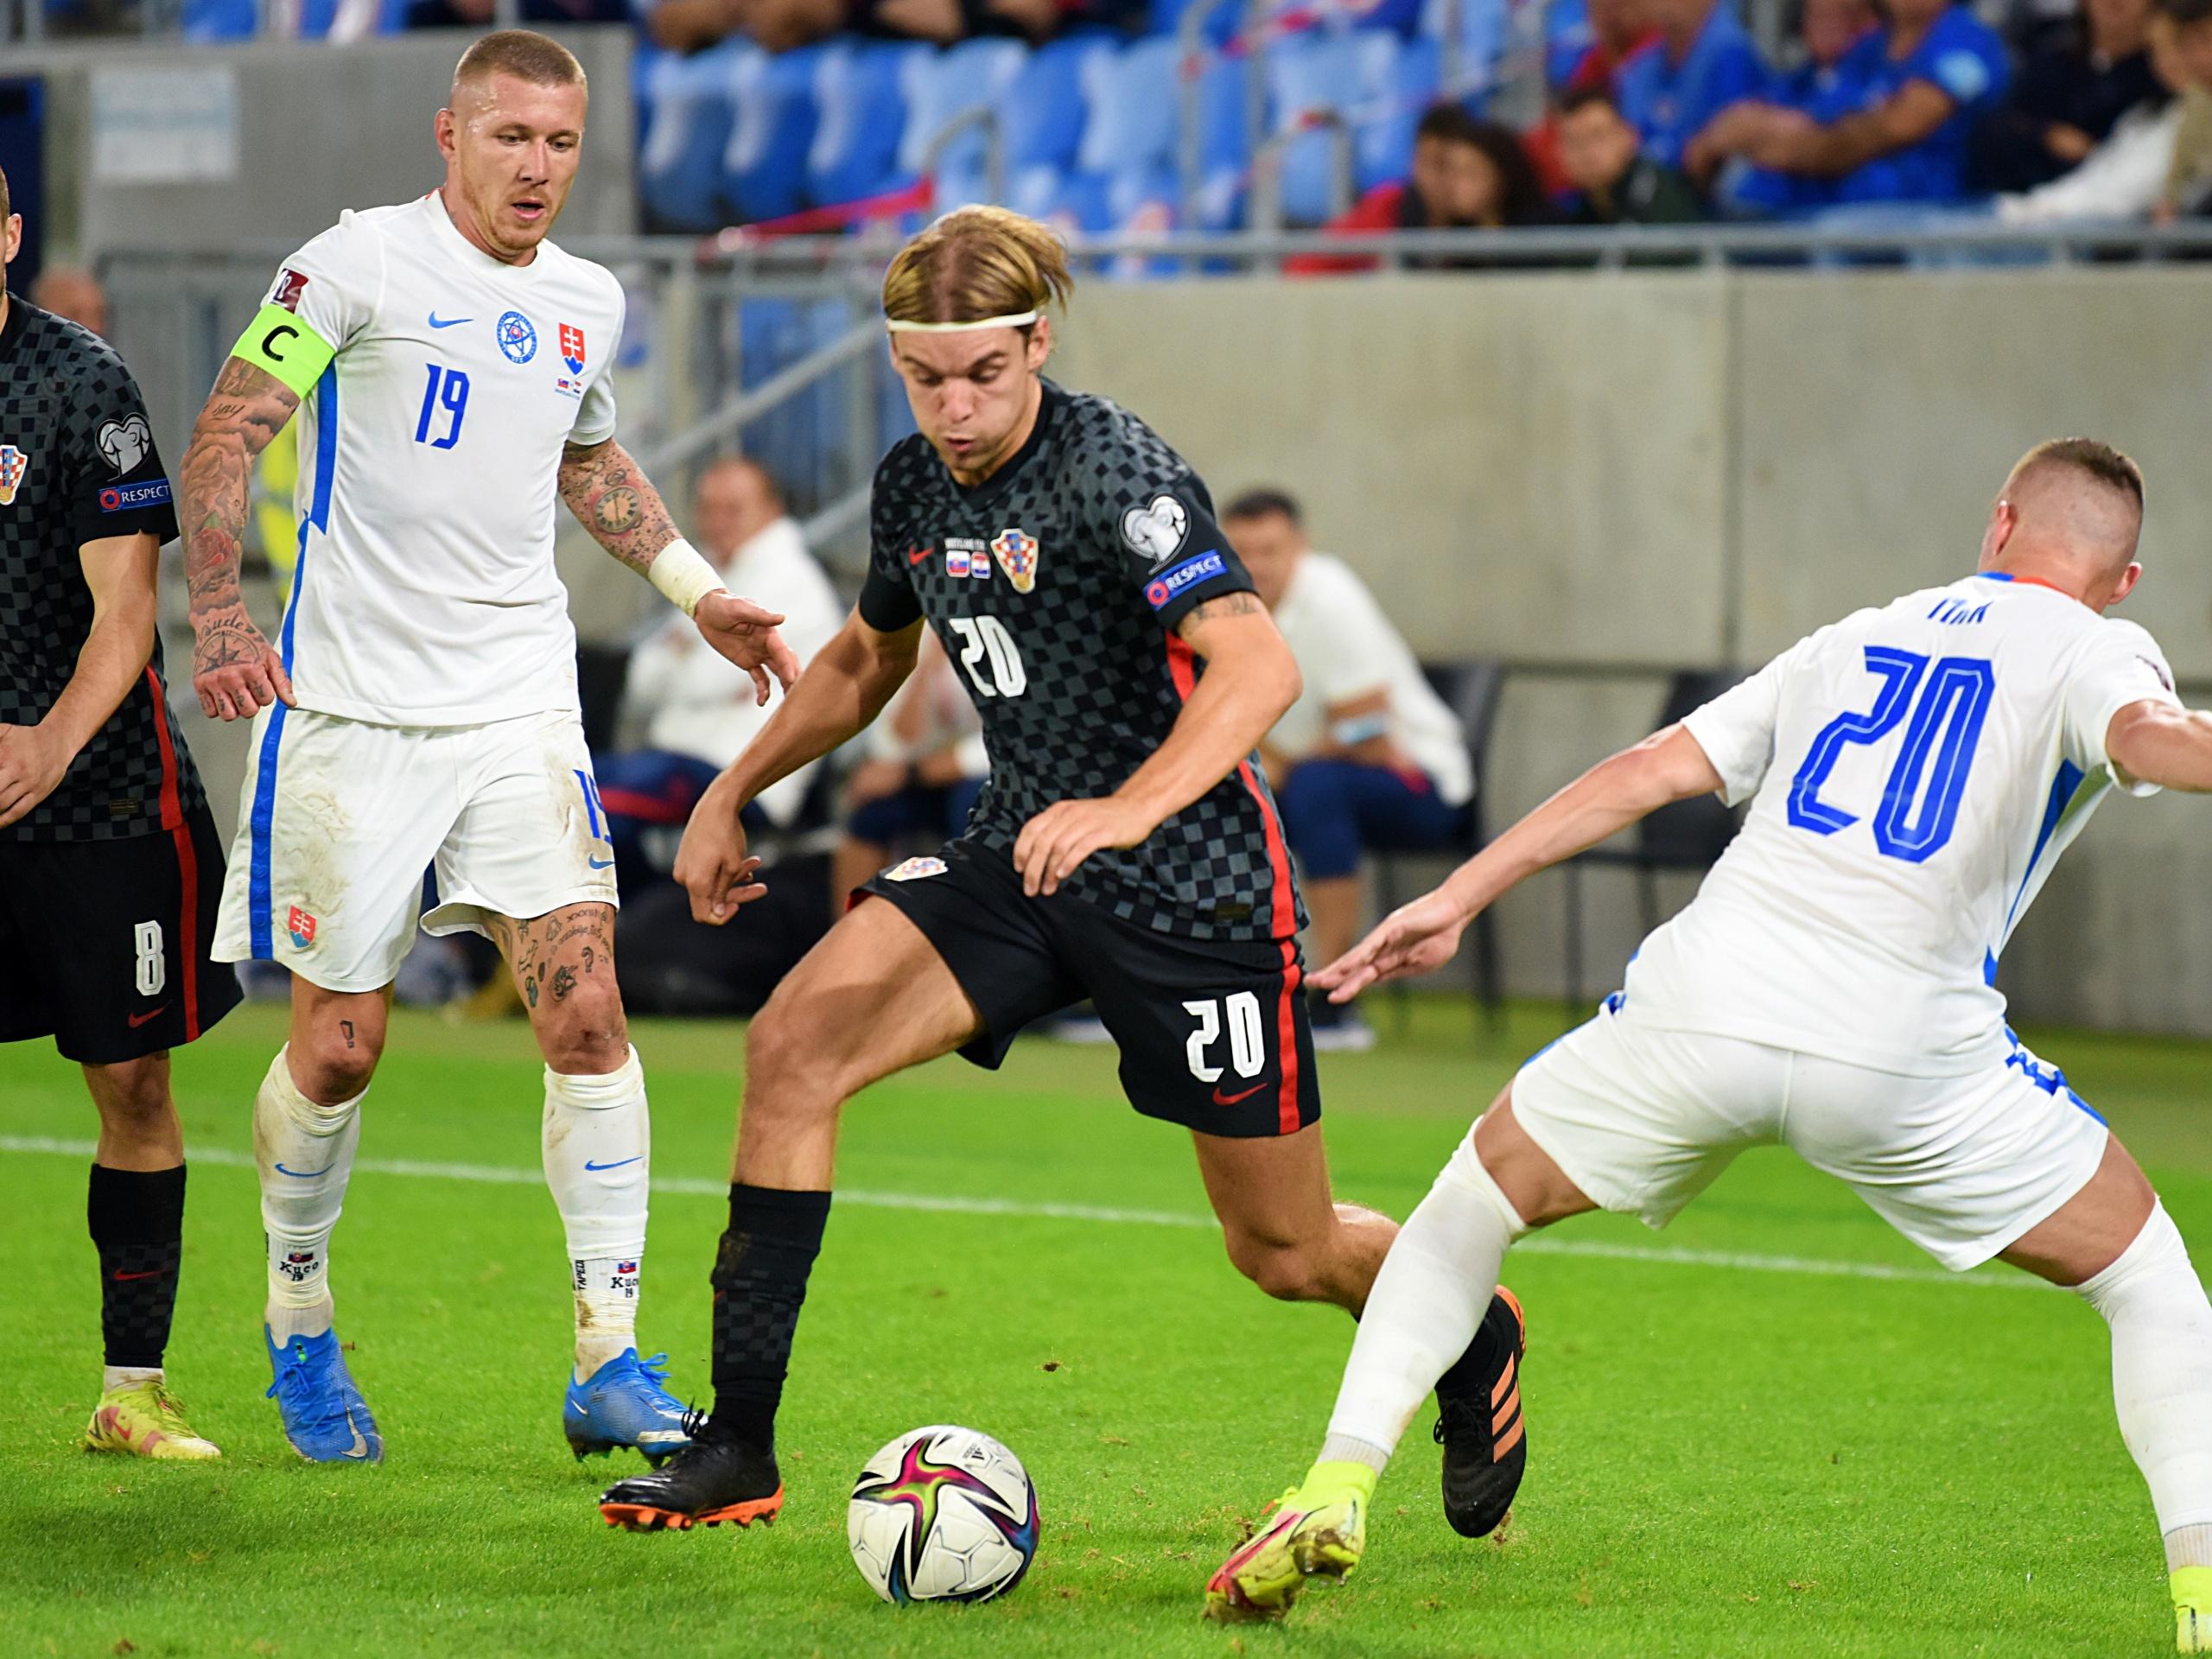 Kvalifikacije za SP 2022.: Rezultati subotnjih utakmice i stanja na ljestvicama